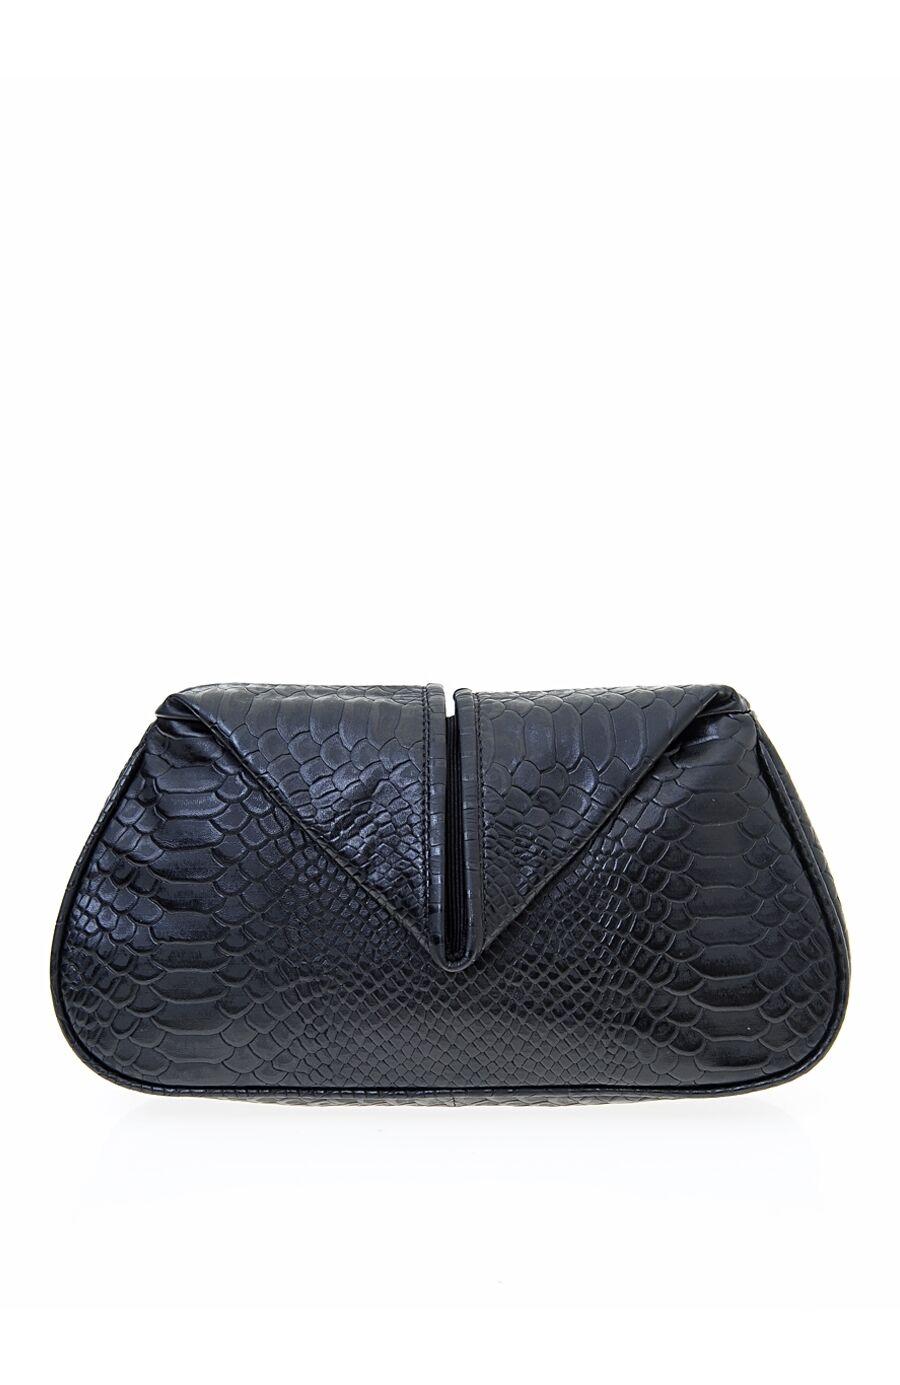 Siyah Clutch Çanta